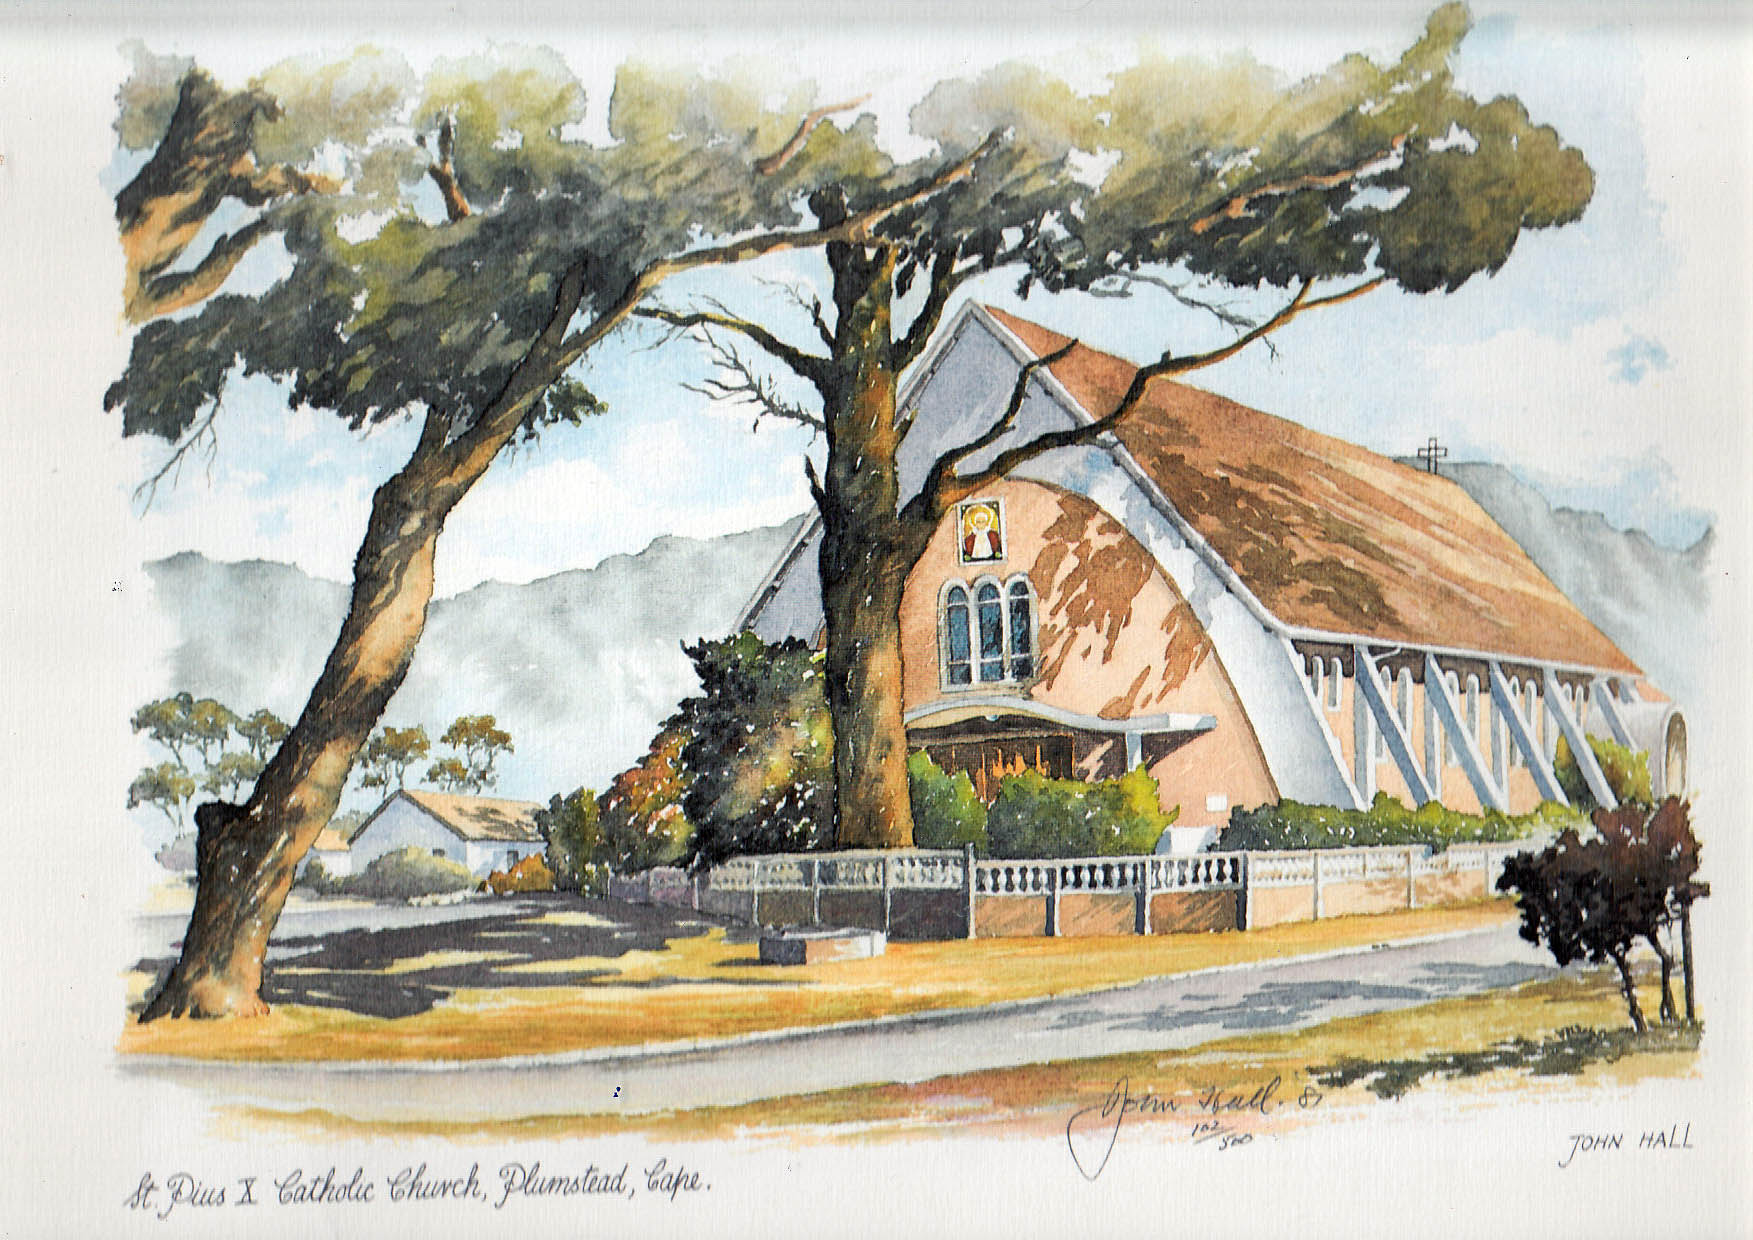 St. Pius X Catholic Church, Plumstead